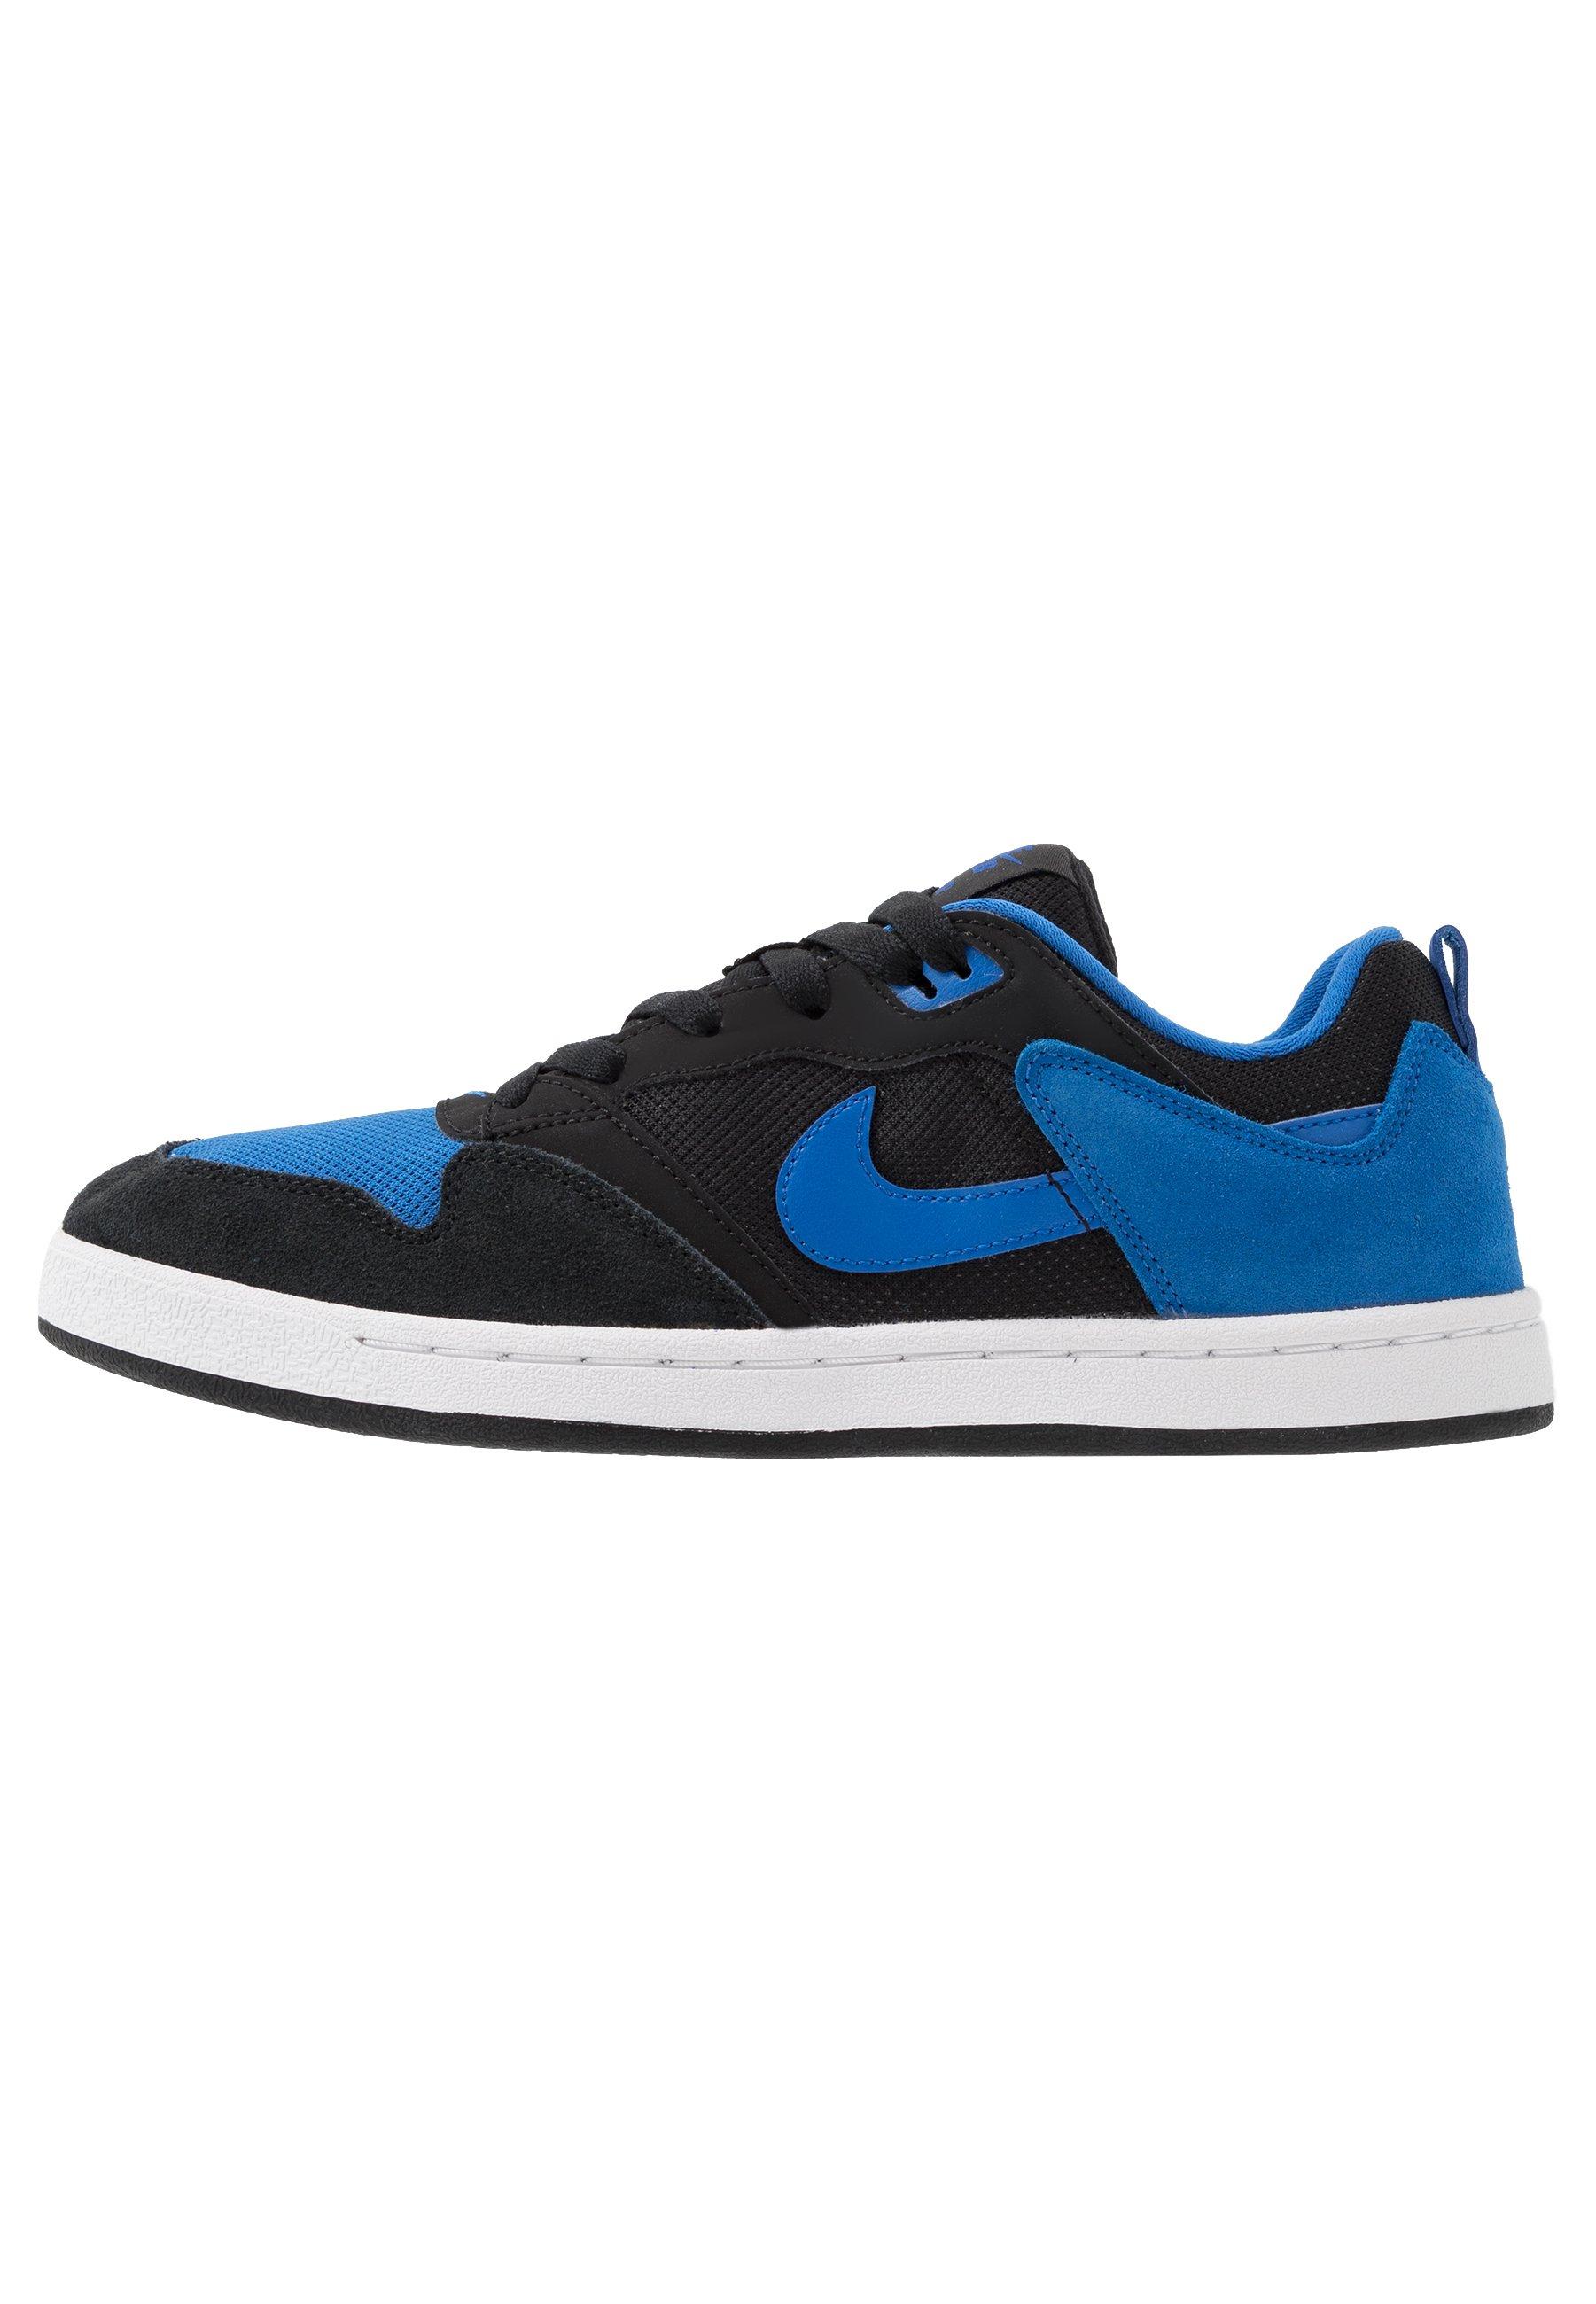 Nike SB ALLEYOOP Scarpe skate blackroyal blue Zalando.it